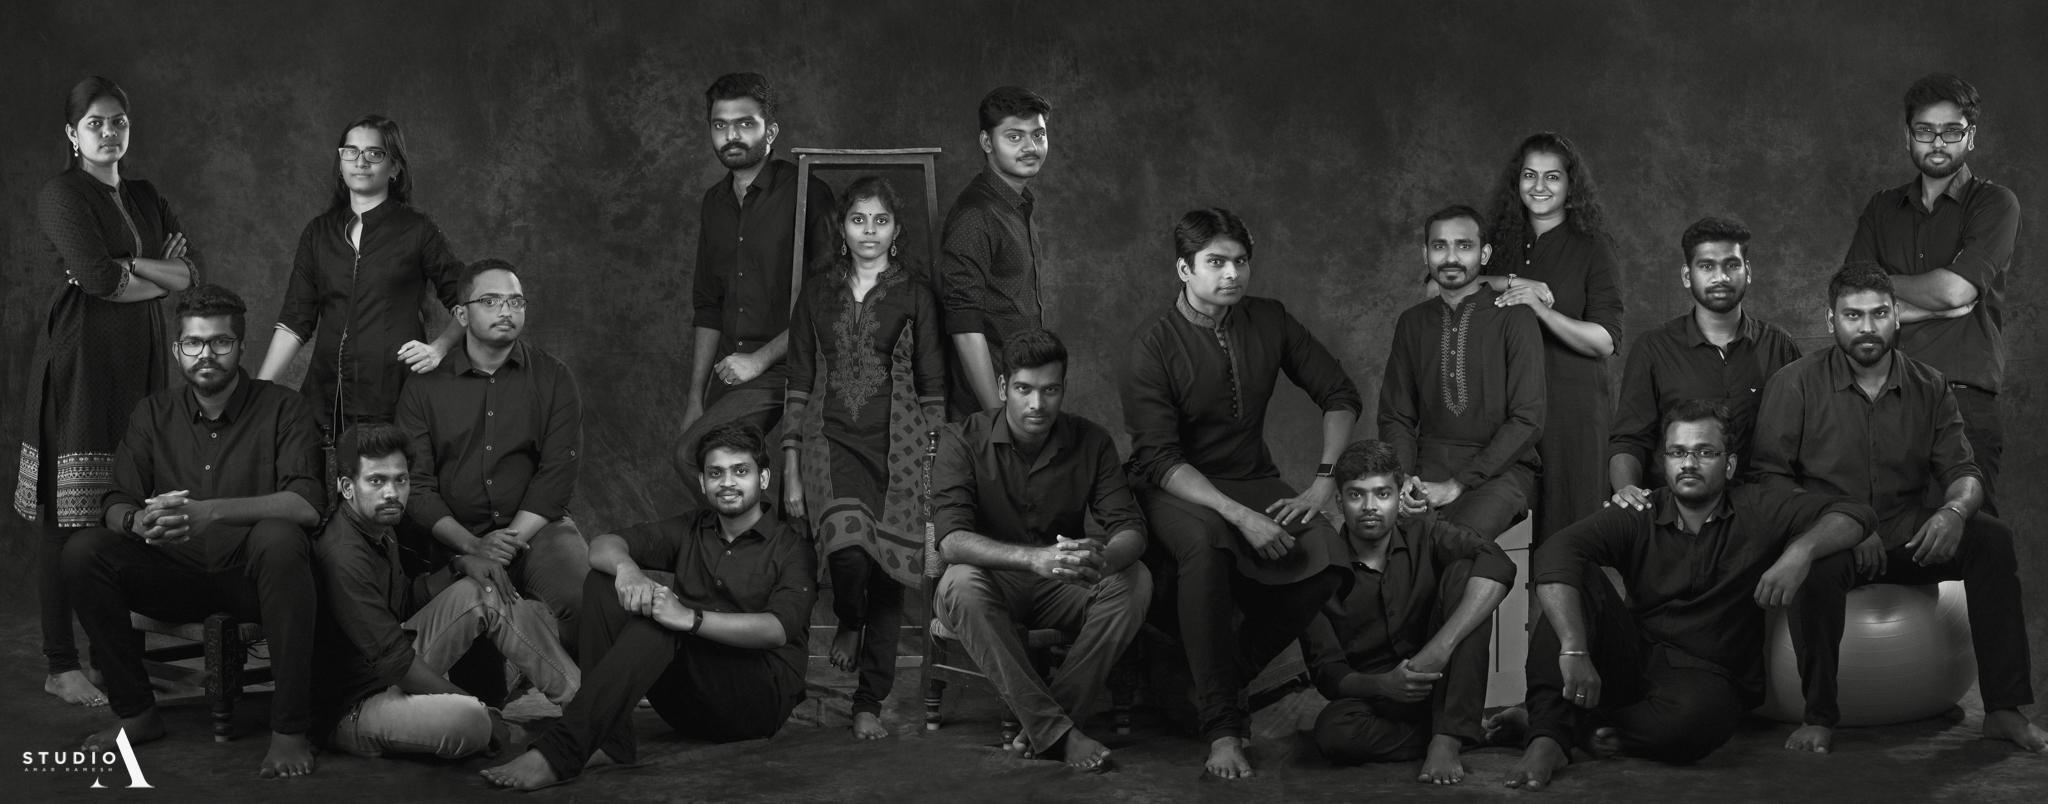 portraits by Amarramesh